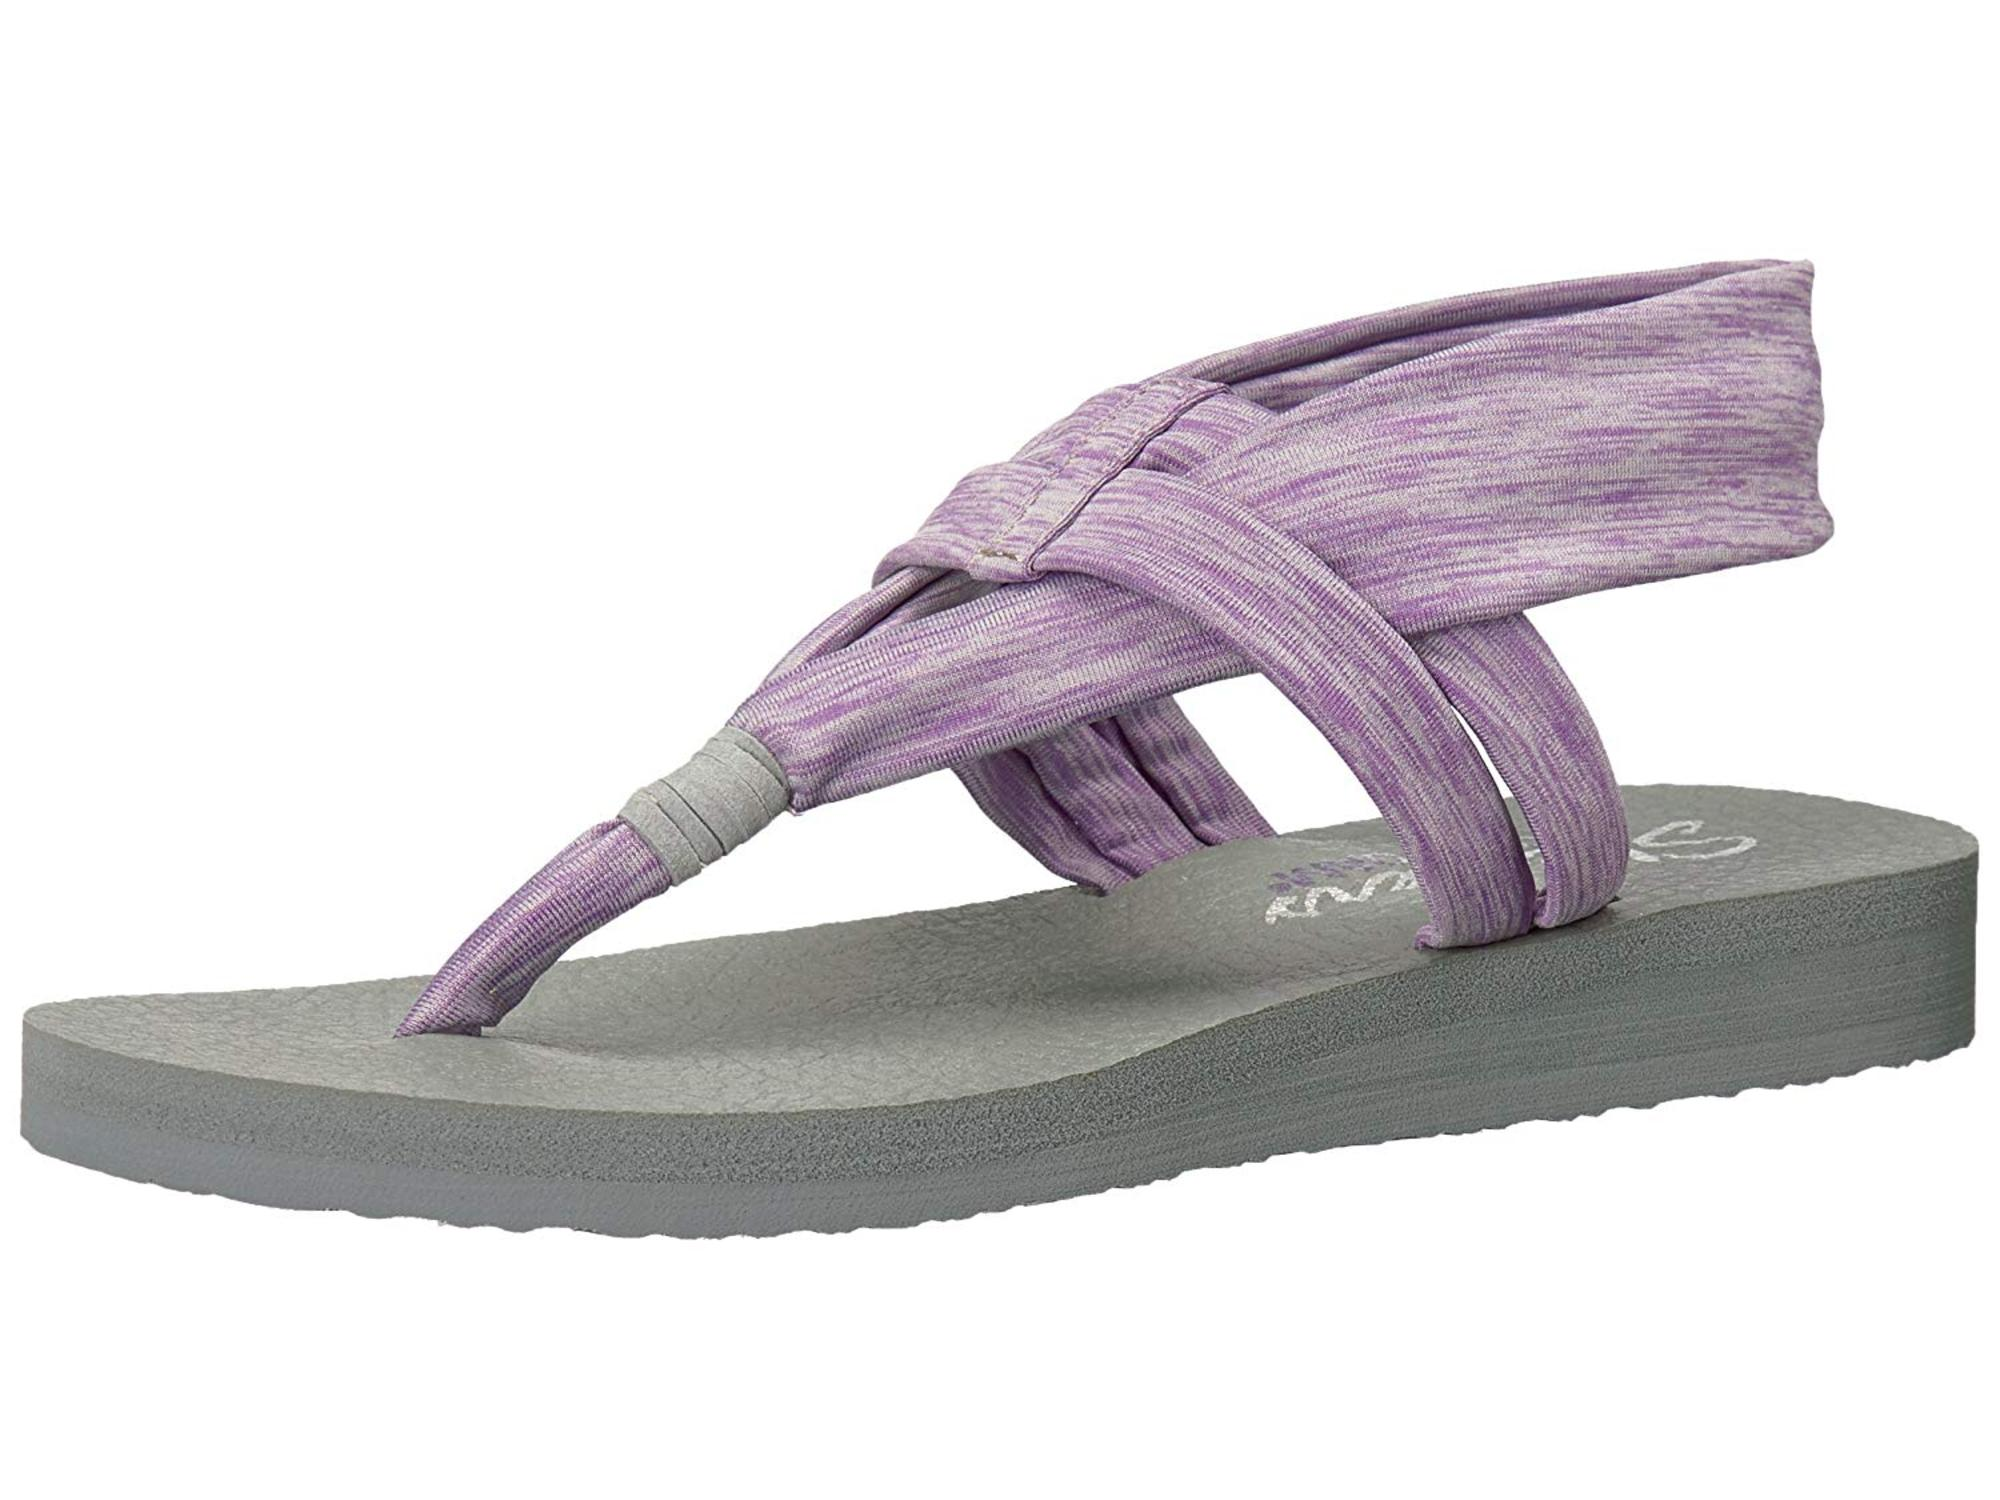 Skechers Womens Meditation-Studio Kicks Open Toe Casual Ankle Strap Sandals